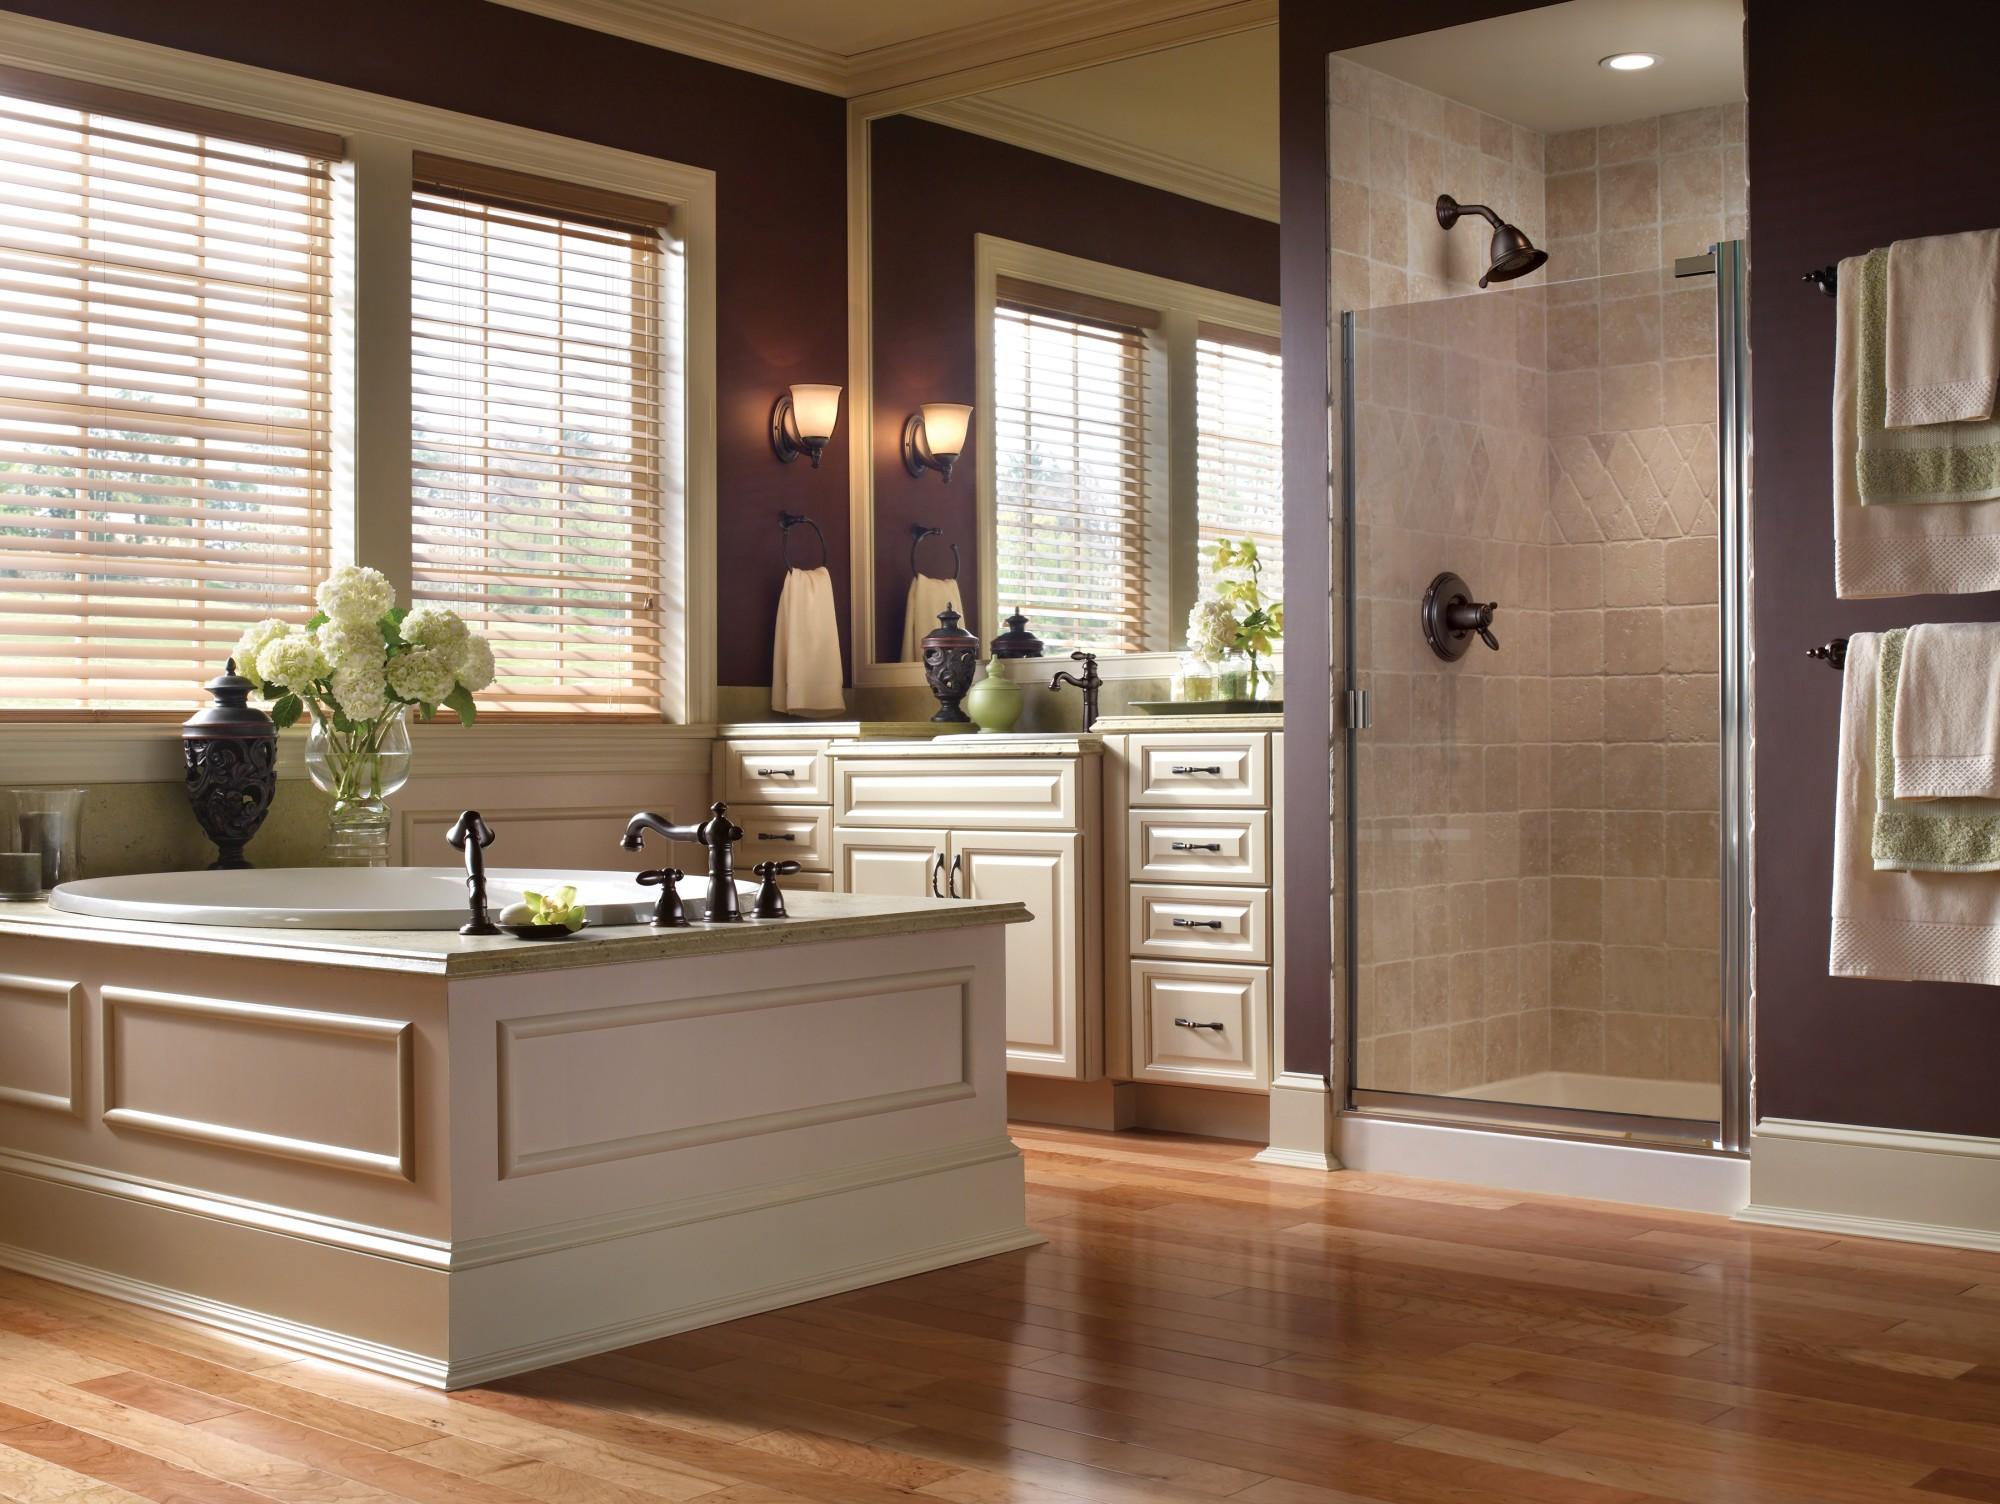 Delta Victorian 555lf Single Handle Centerset Bathroom: Delta 555LF-SS Victorian 1-Hole Bathroom Faucet W/ Pop-Up